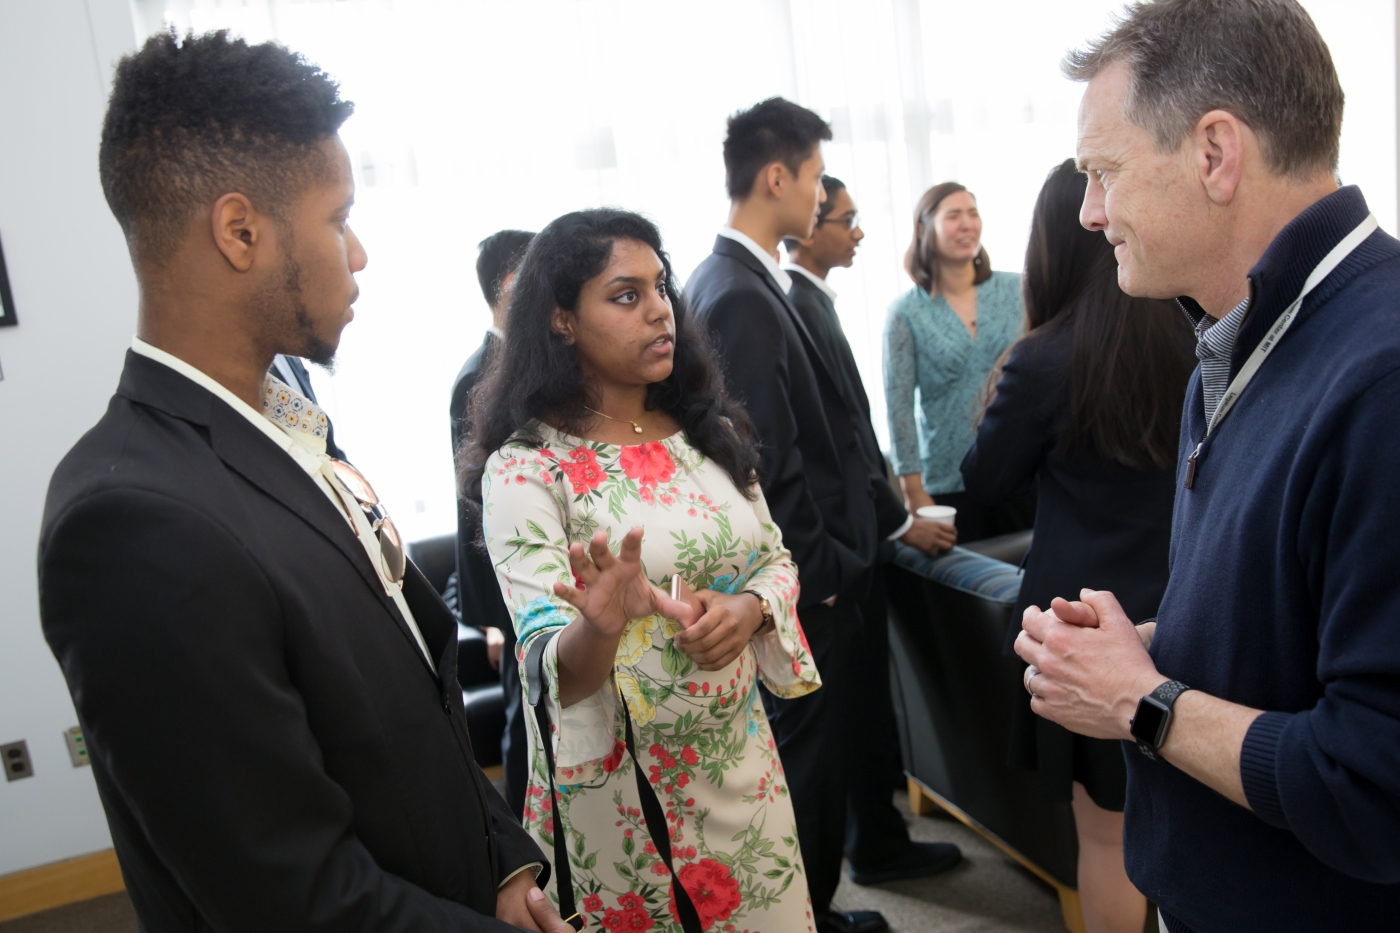 find entrepreneurial mentorship at MIT LAUNCH